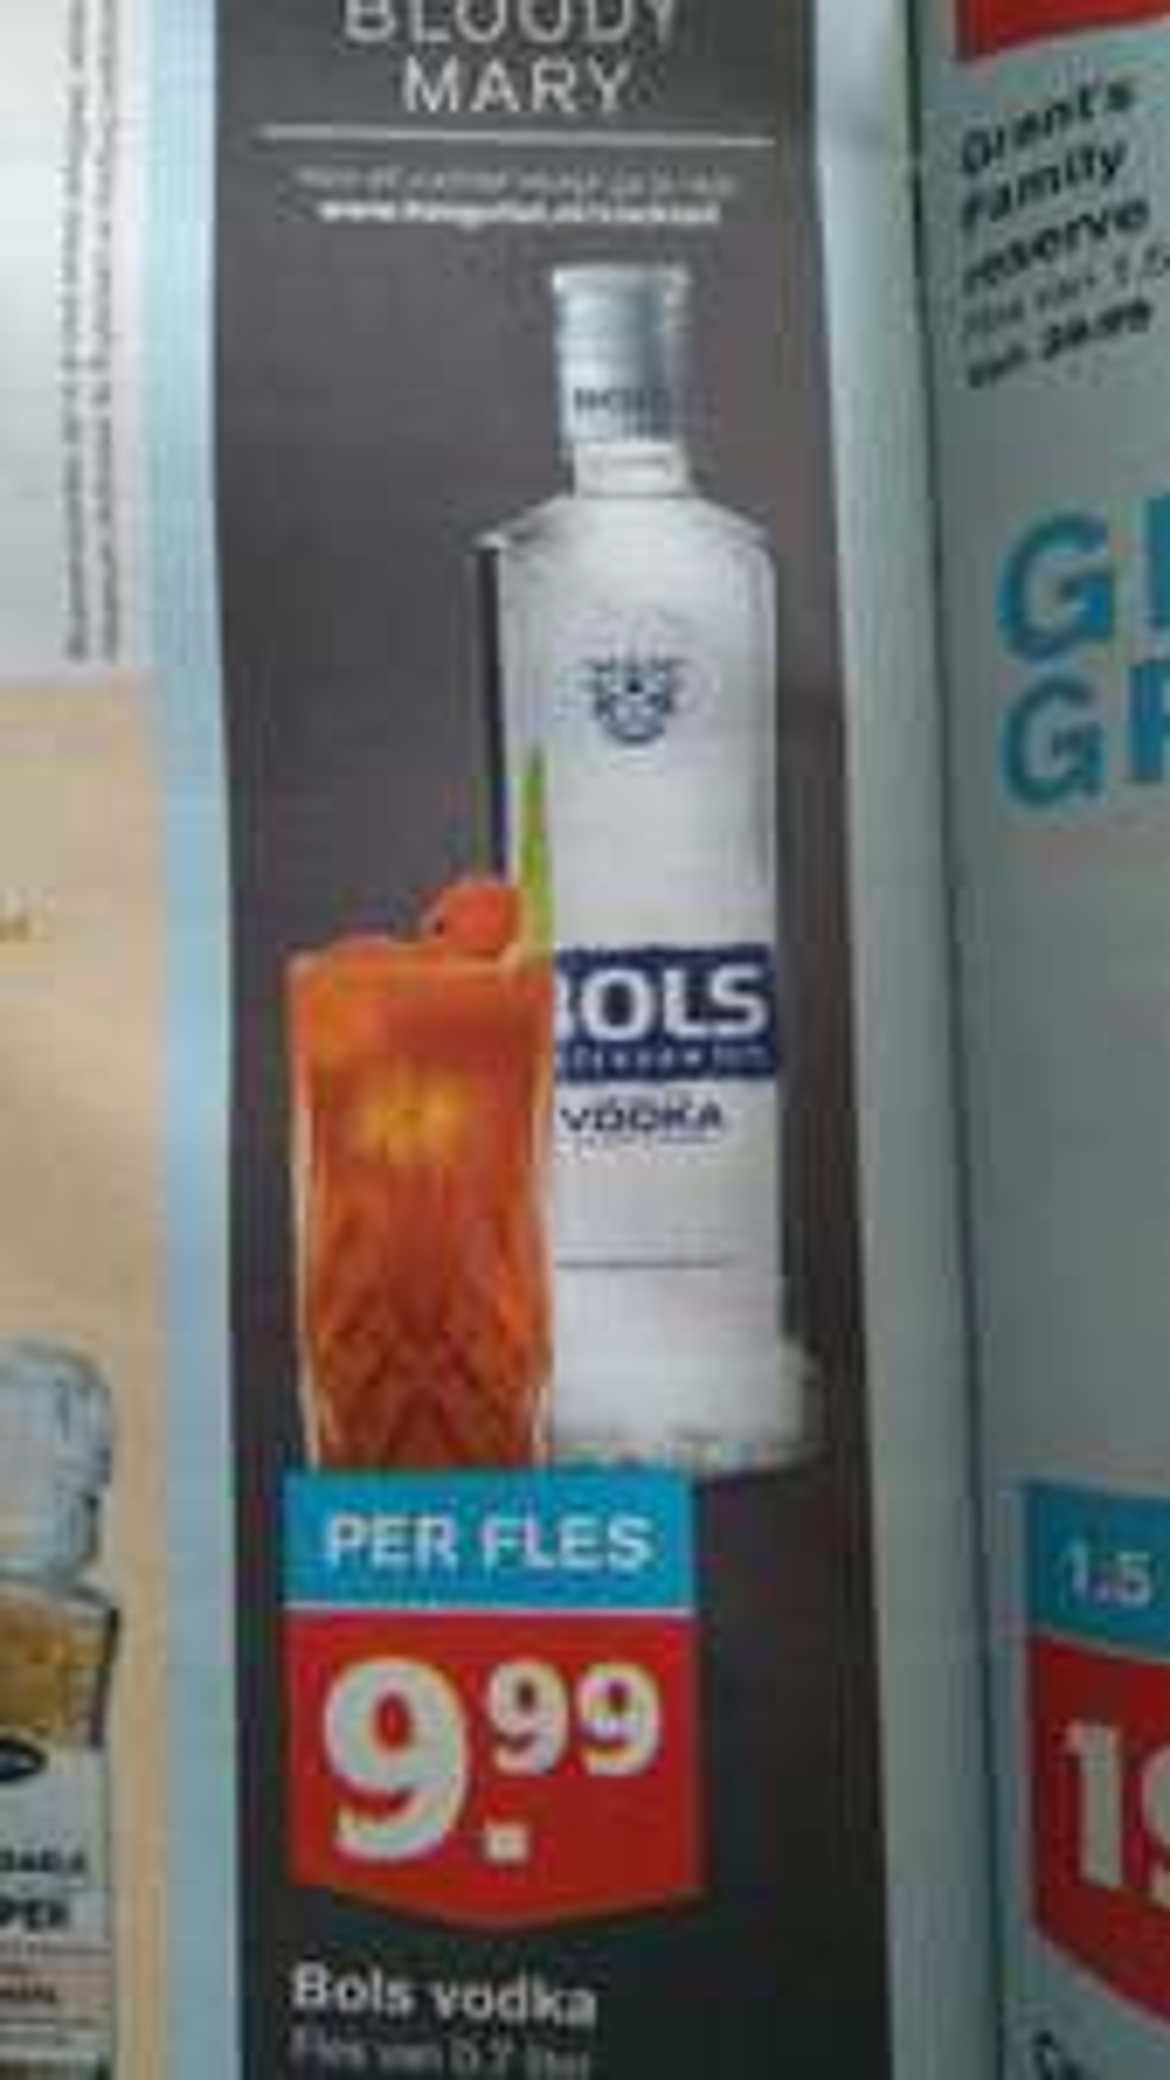 Bols Vodka 70cl bij Hoogvliet